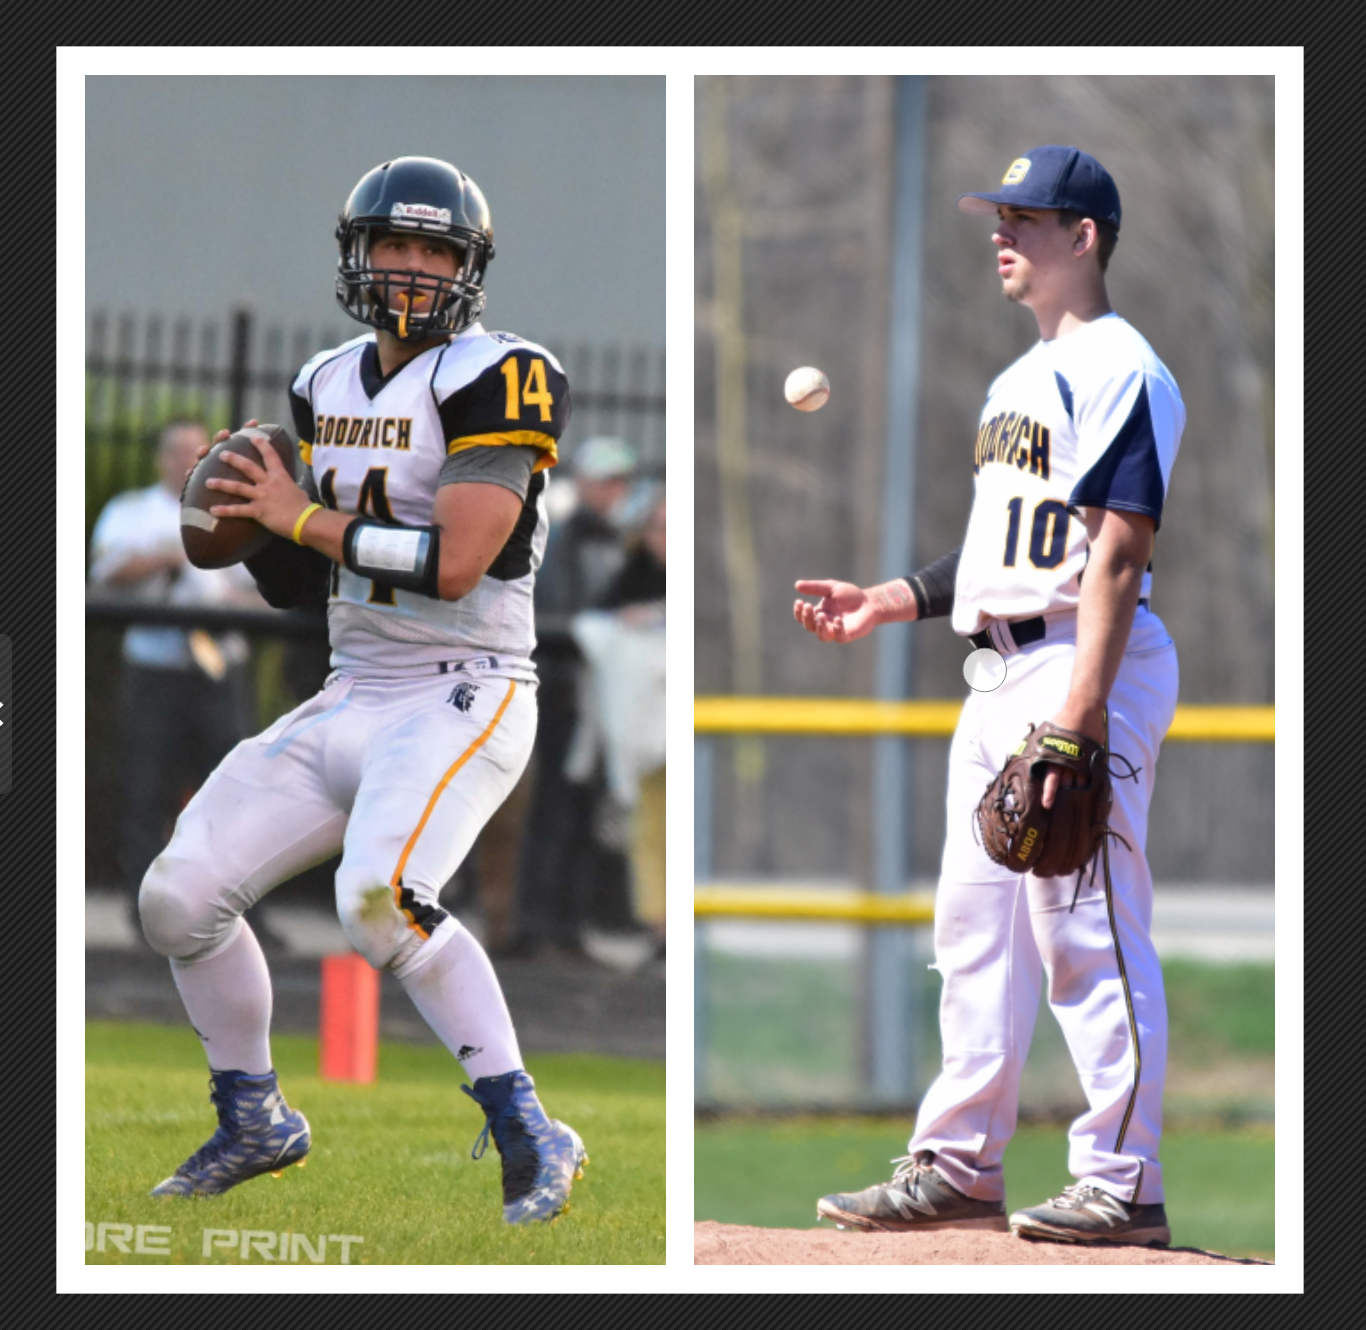 Joe Toporek - Goodrich, MI - Football & Baseball